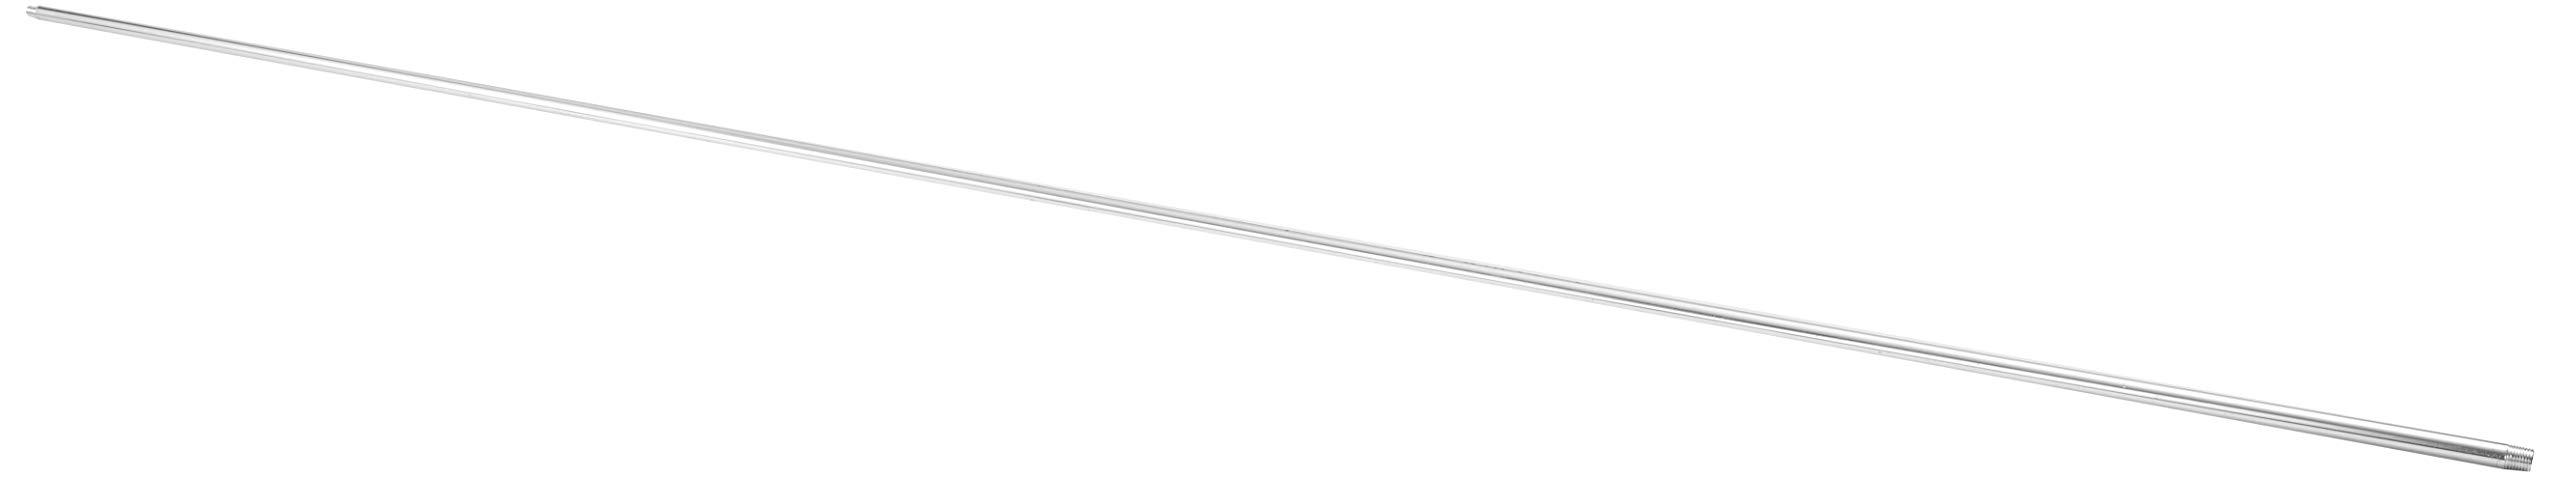 "AR Annovi Reverberi 5224 AR North America Pressure Washer Lance, 96"", Gray"